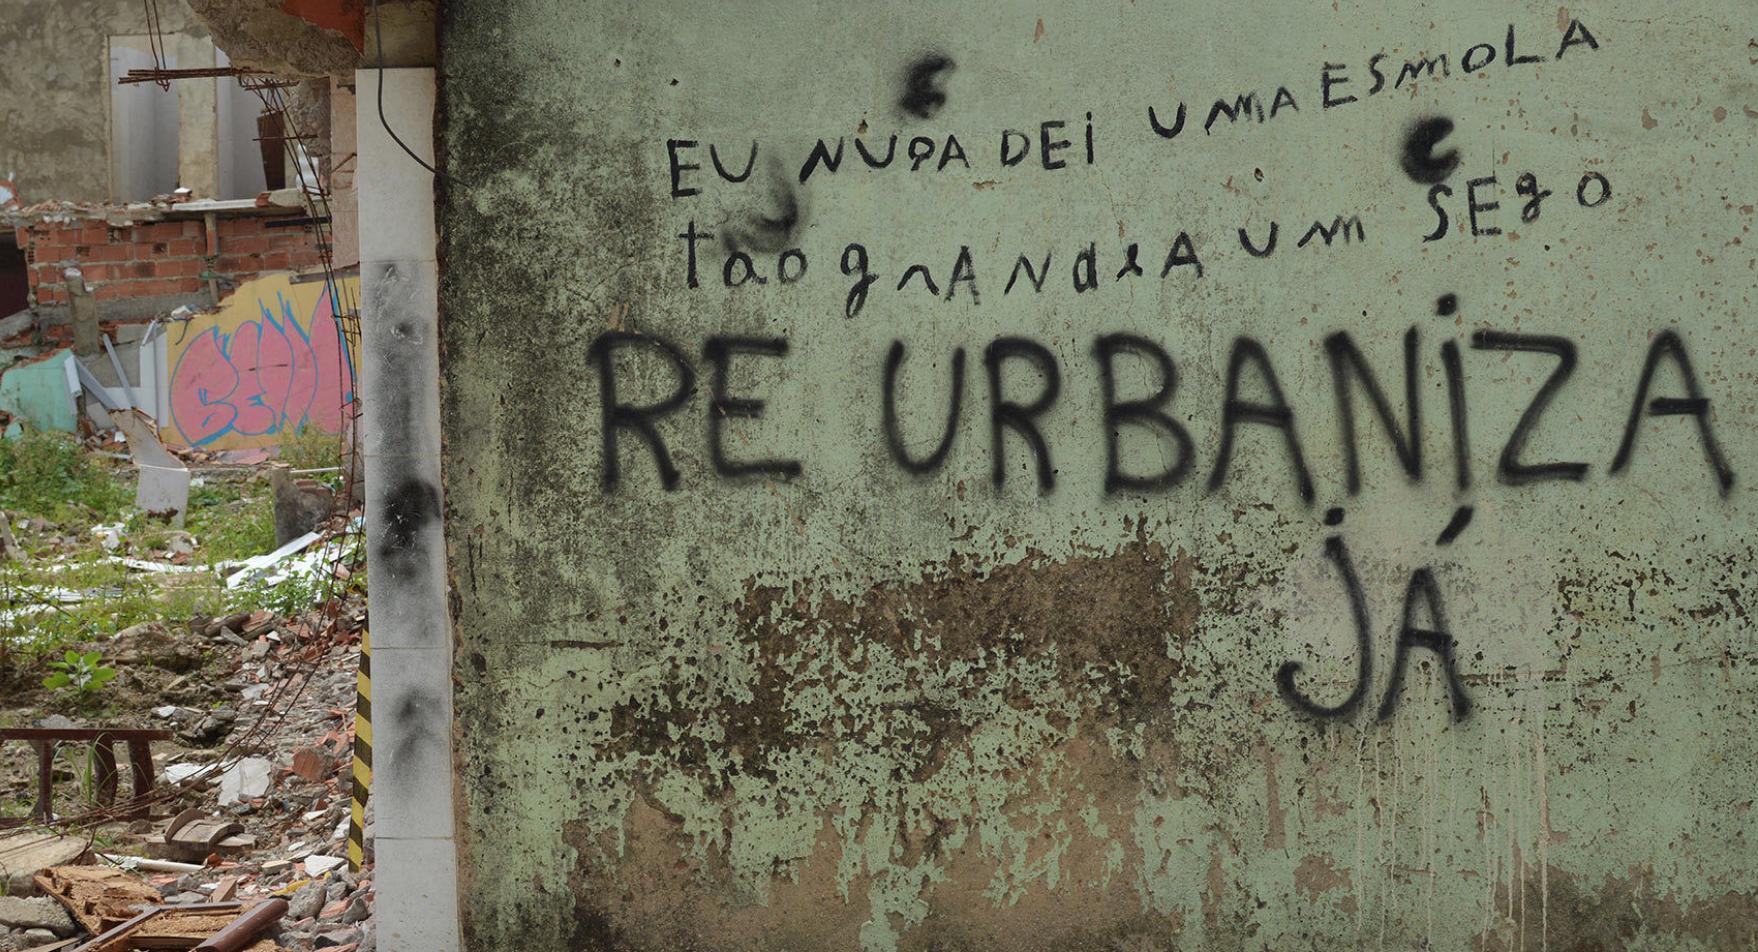 Grafitti Re Urbaniza Já. Foto: A. Lezcano do El Español http://bit.ly/2IoVEgu